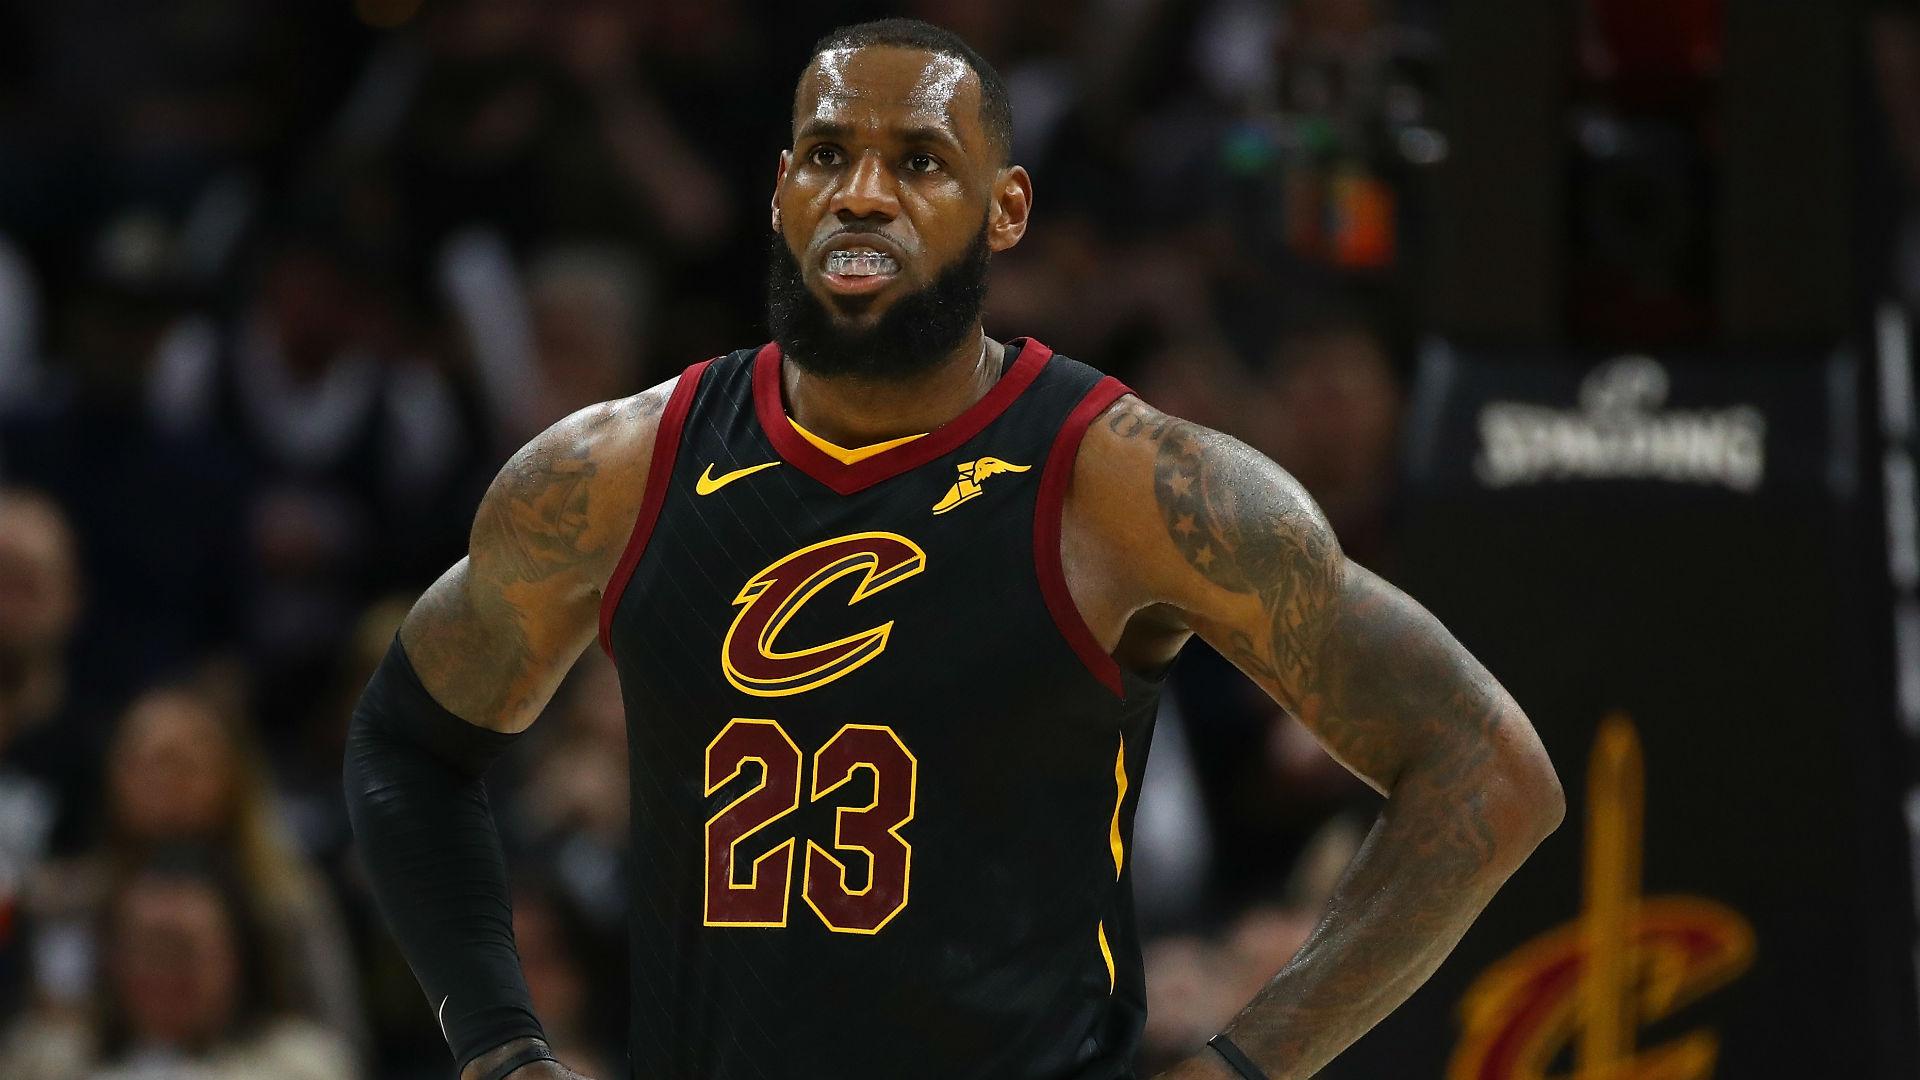 NBA Playoffs 2018: LeBron James Has To Be Aggressive, Cavs